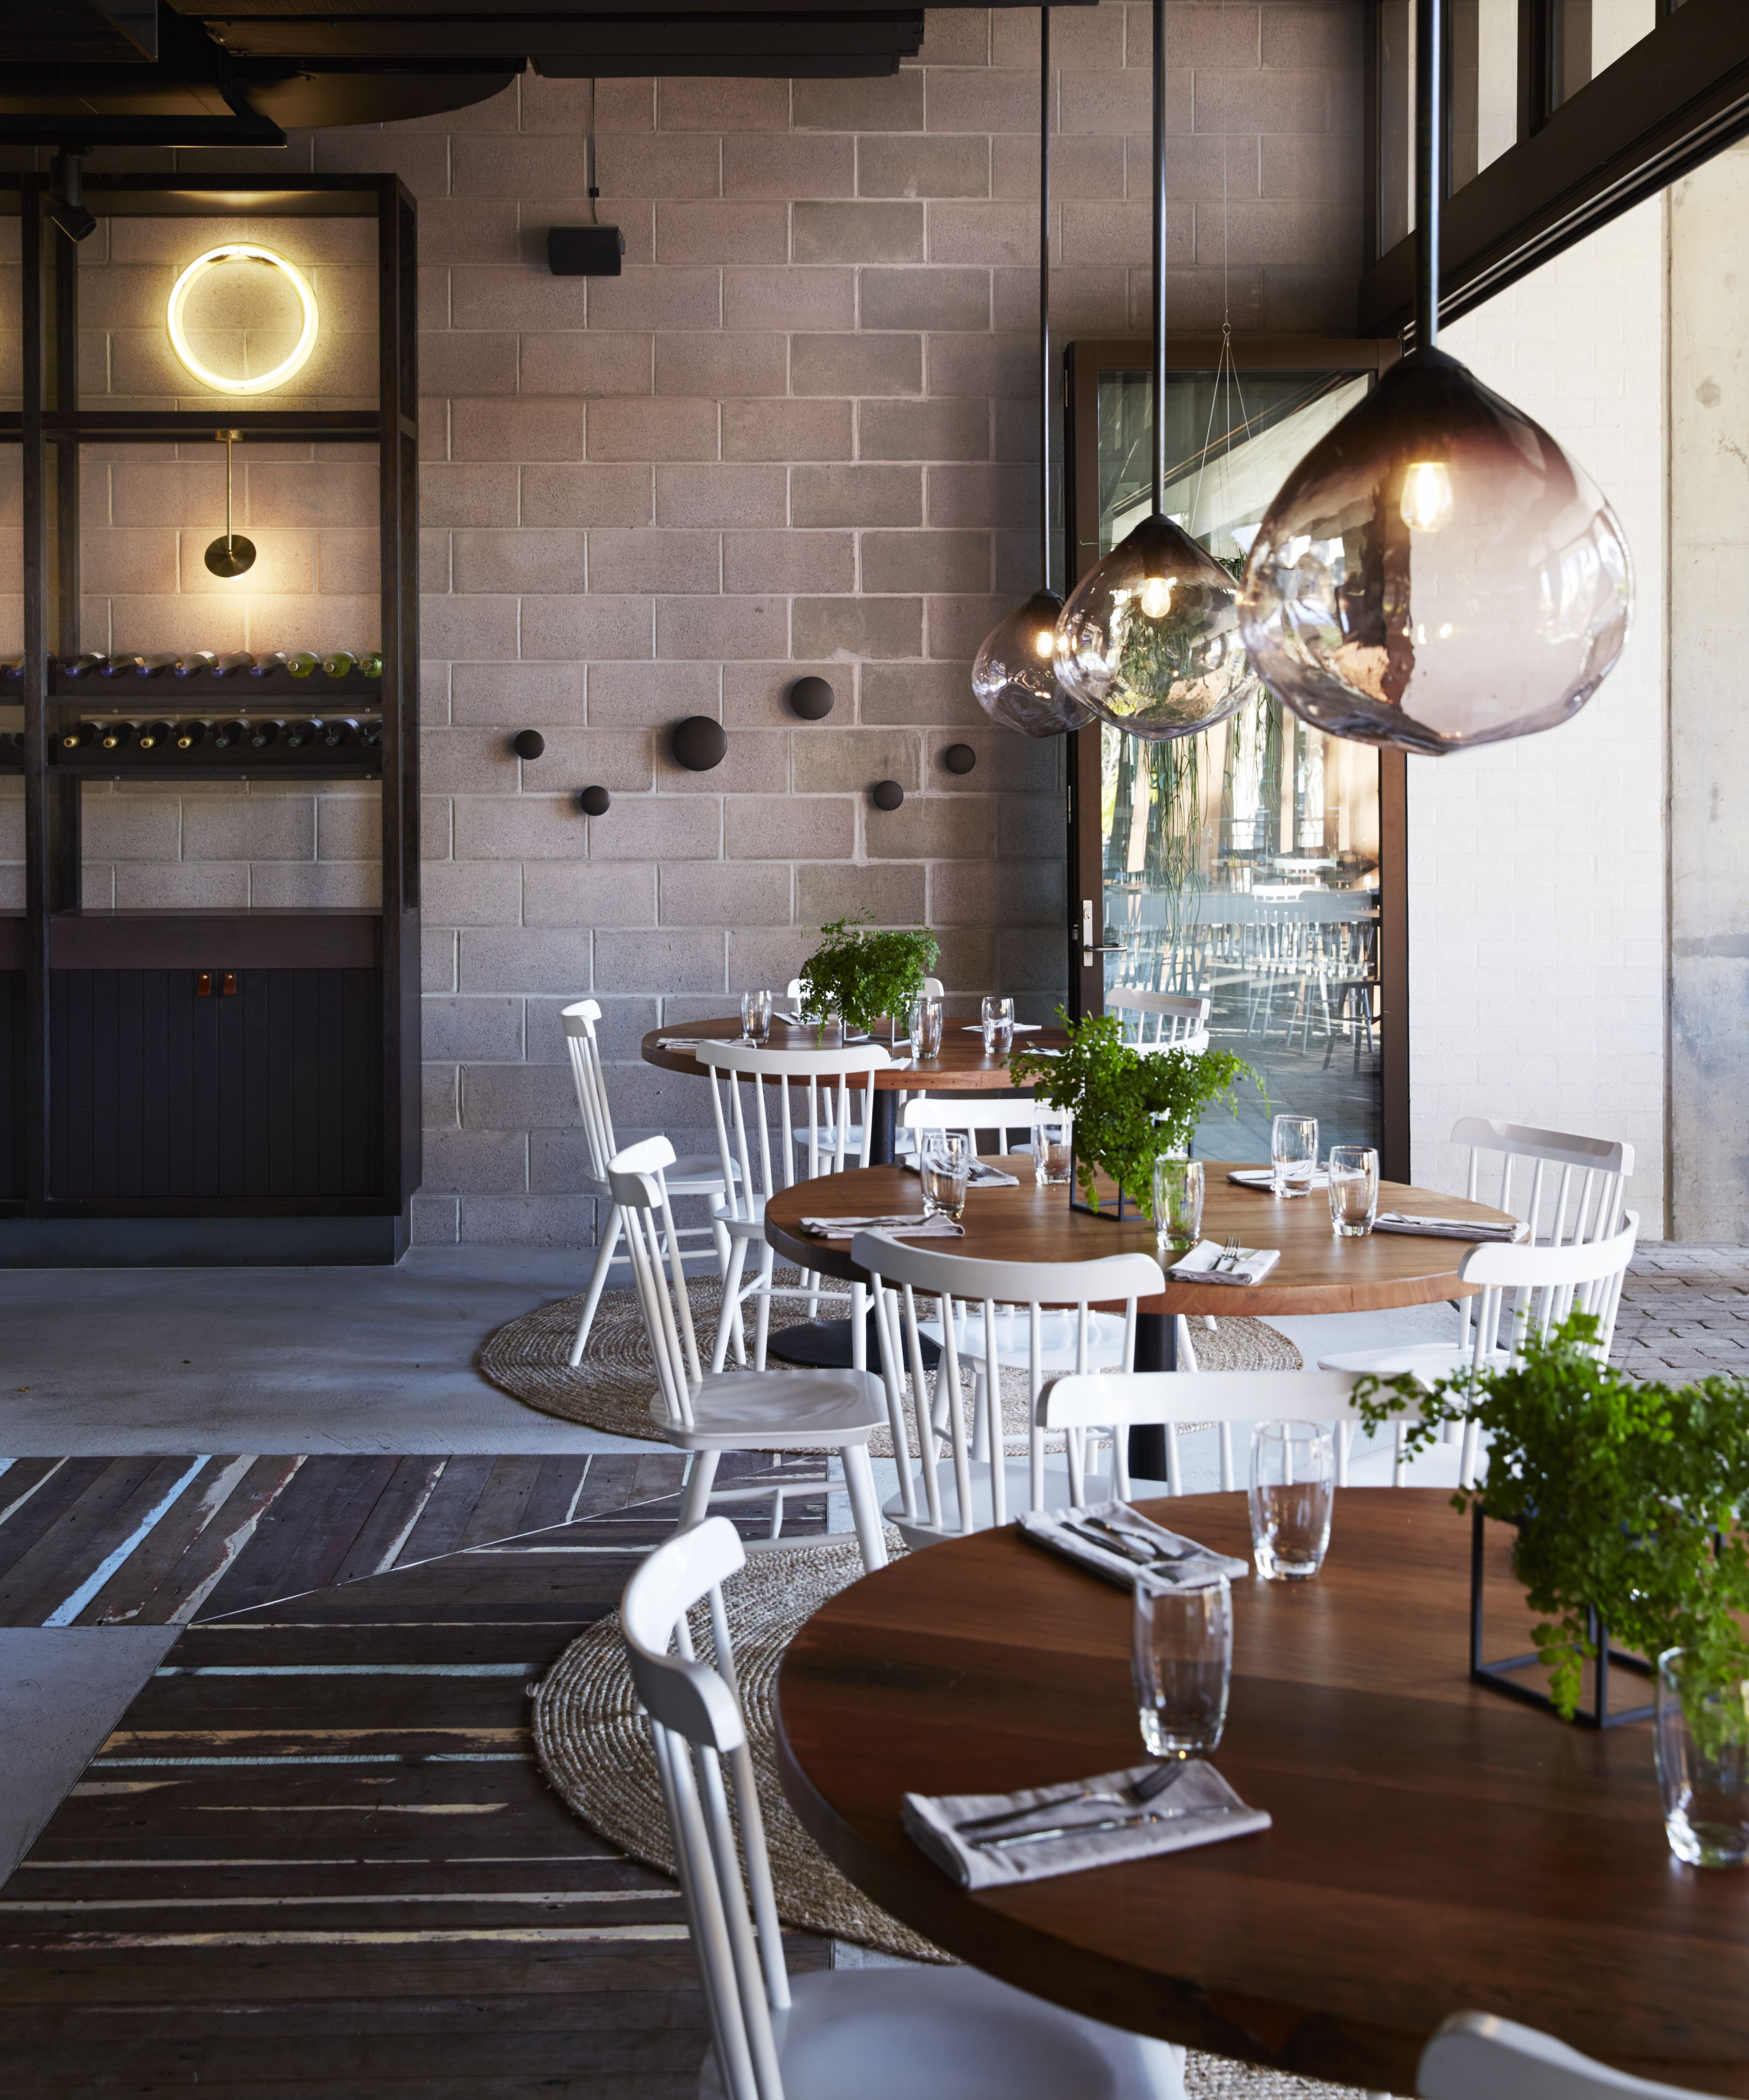 Chair Ironica By Ton Beccafico Bar Trattoria Sydney Australia Design Matt Woods Stylist Lucia Braham Photographer Dave Wheeler 2017